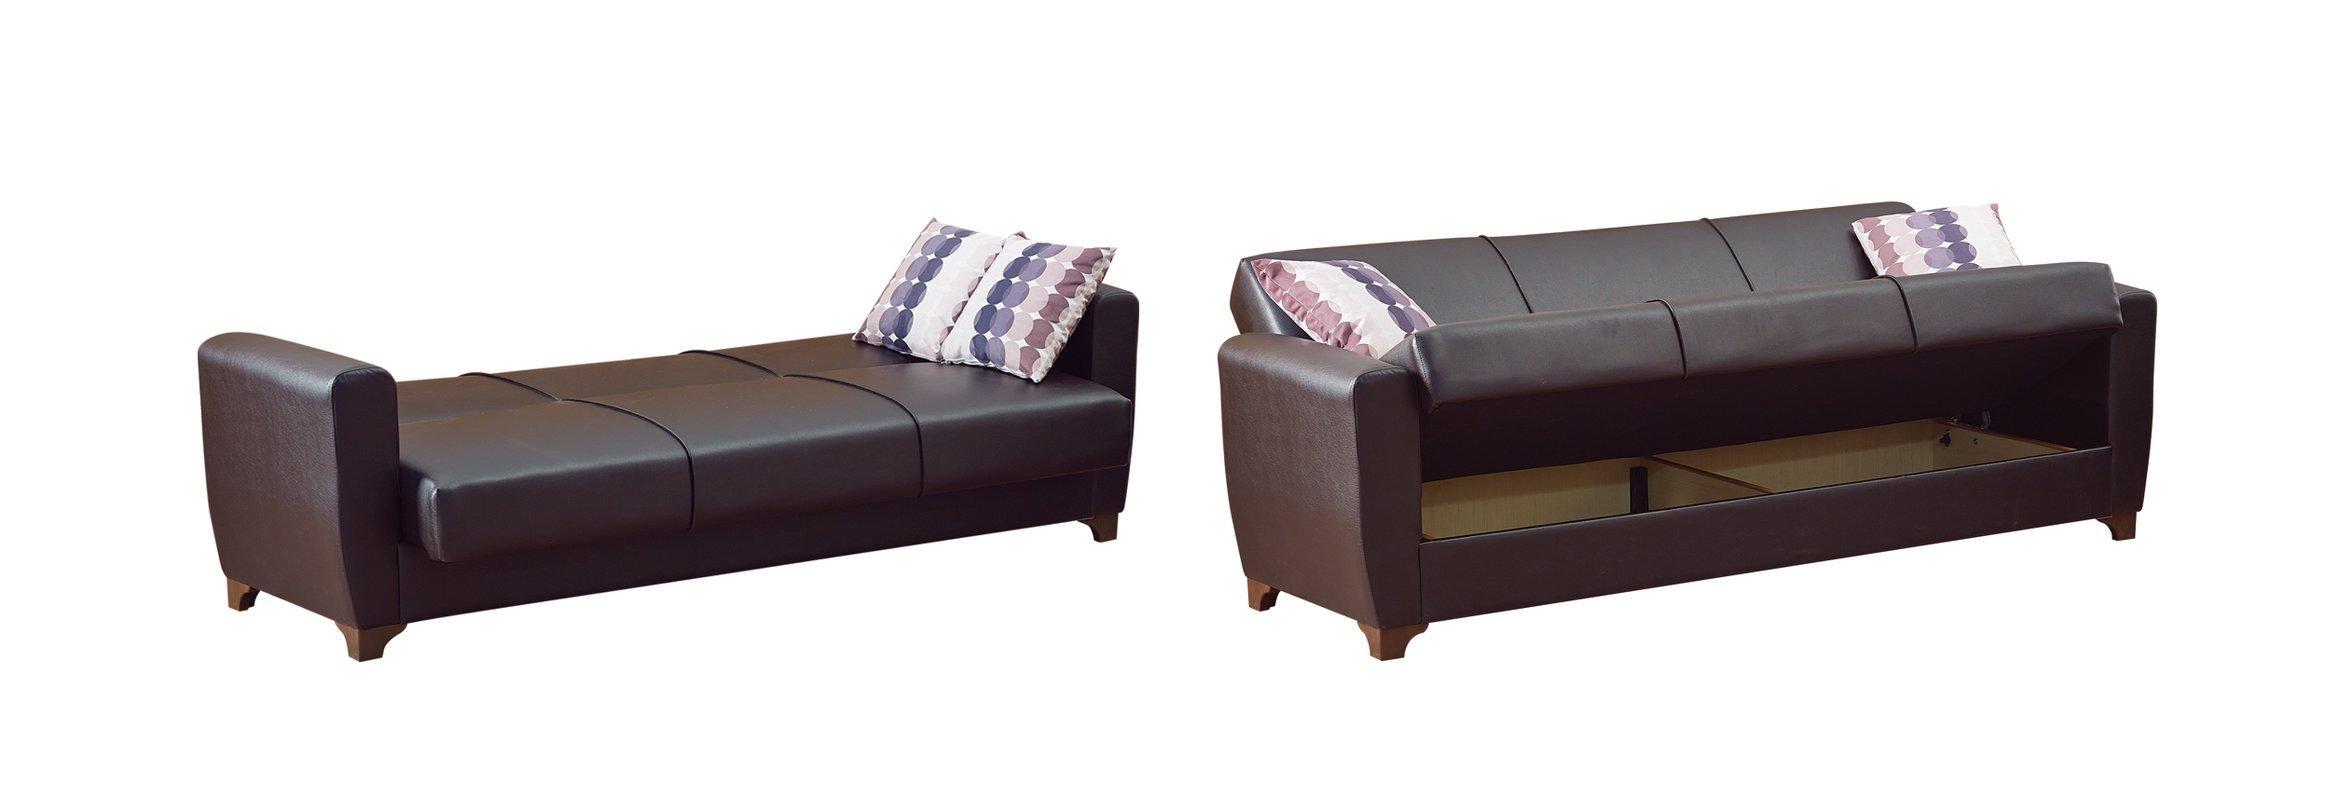 Beyan Queens Sleeper Sofa & Reviews | Wayfair For Convertible Queen Sofas (Image 4 of 20)